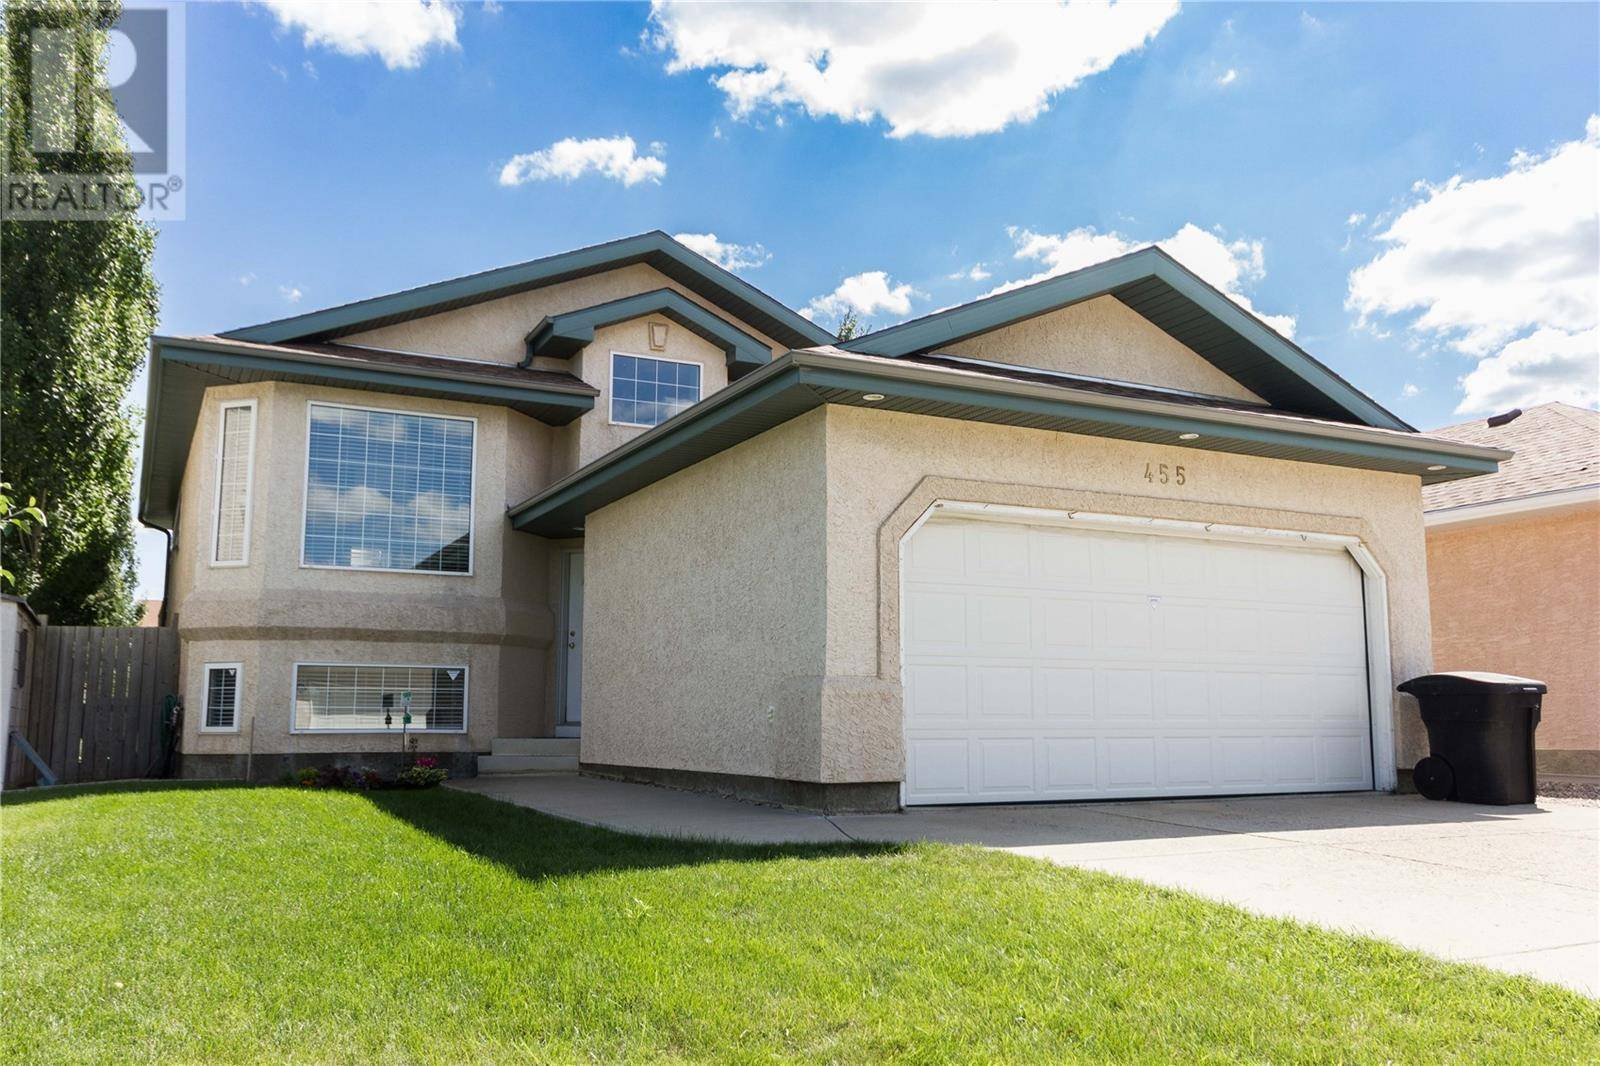 House for sale at 455 Briarvale Ct Saskatoon Saskatchewan - MLS: SK779032